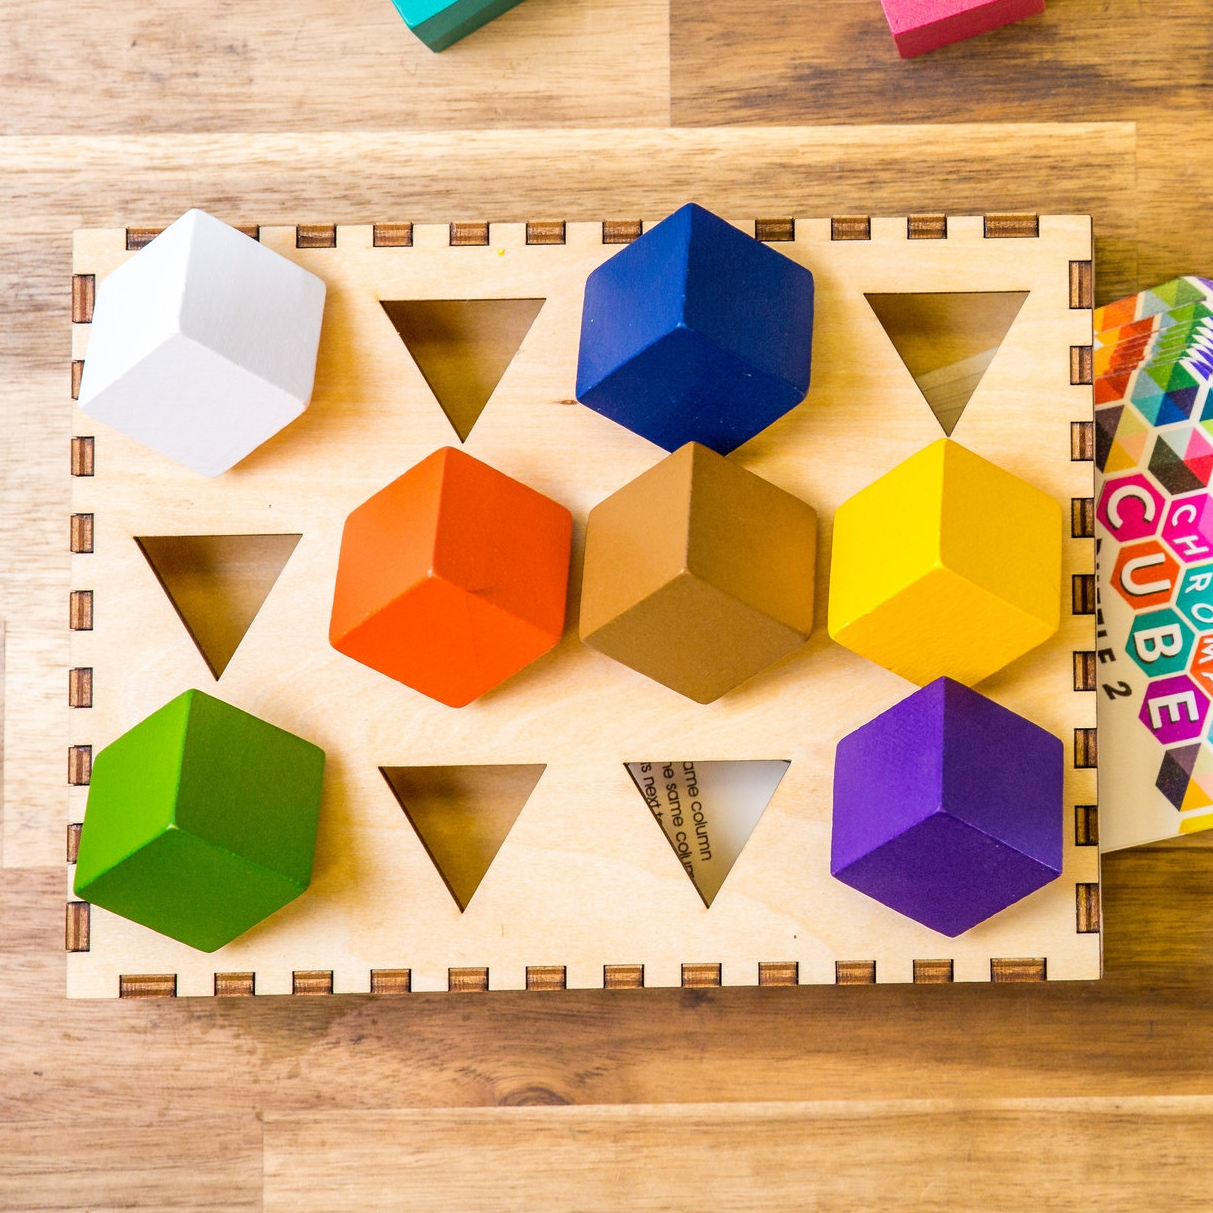 Chroma Cube Puzzle 1.jpg